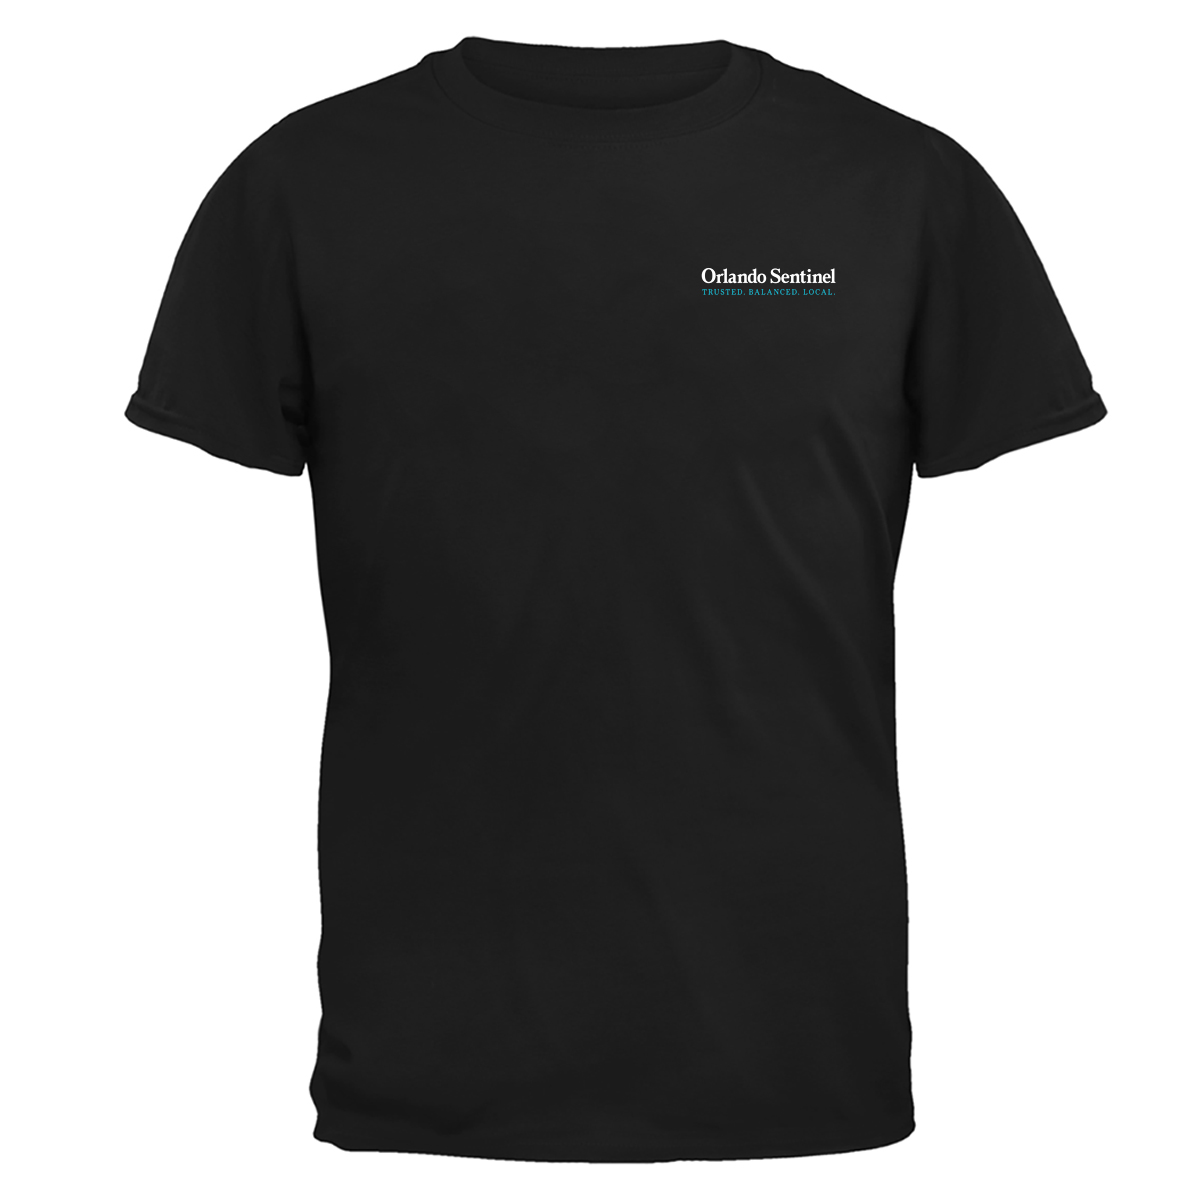 Orlando Sentinel T-Shirt